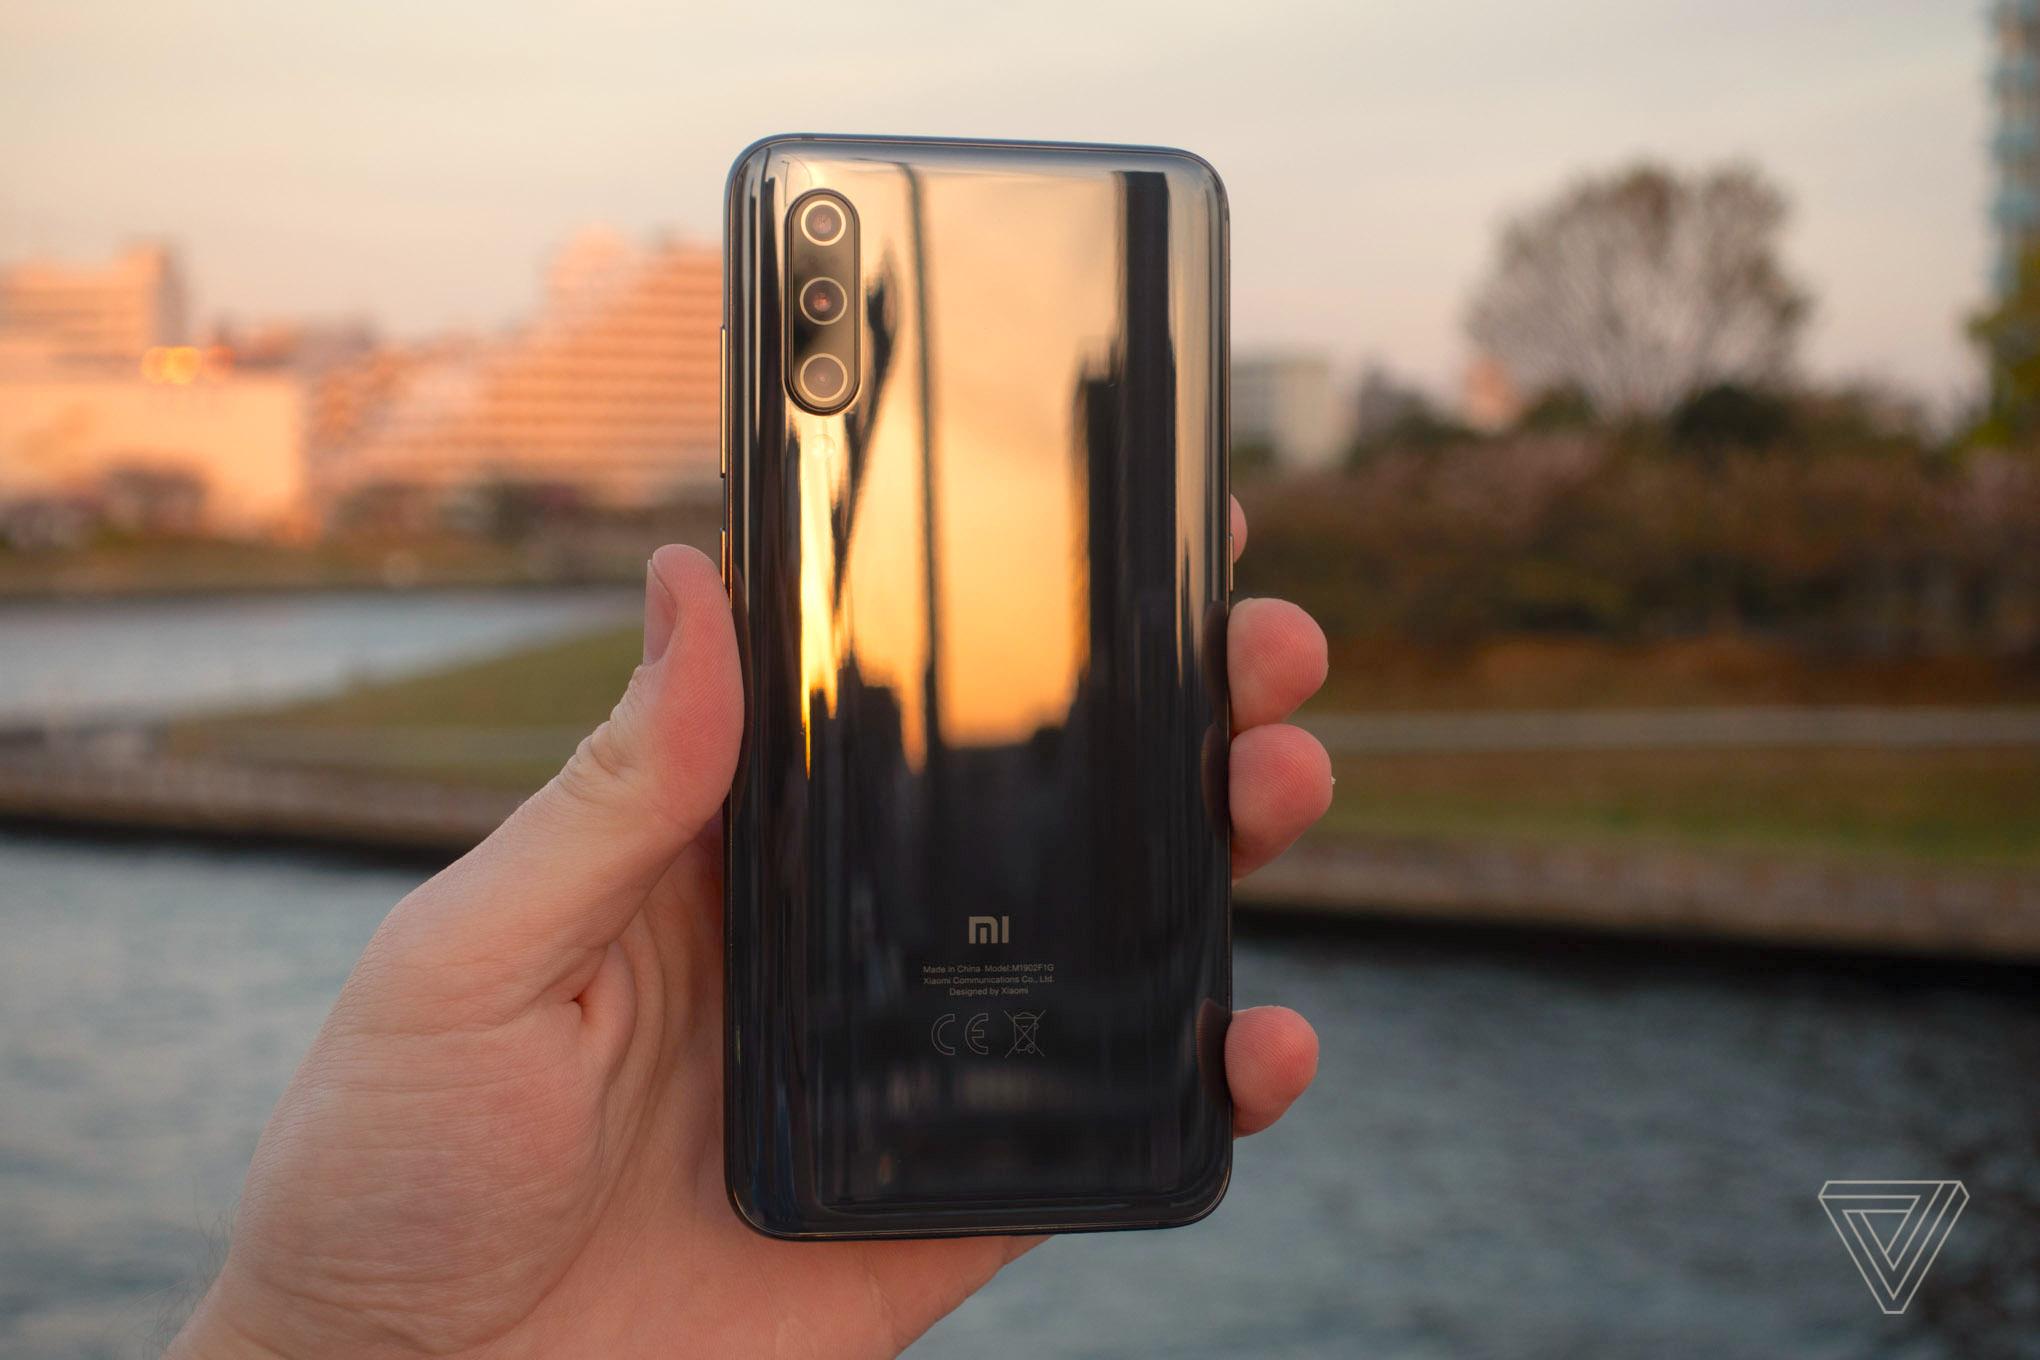 Xiaomi's Mi 9, featuring a Mi logo on the back.